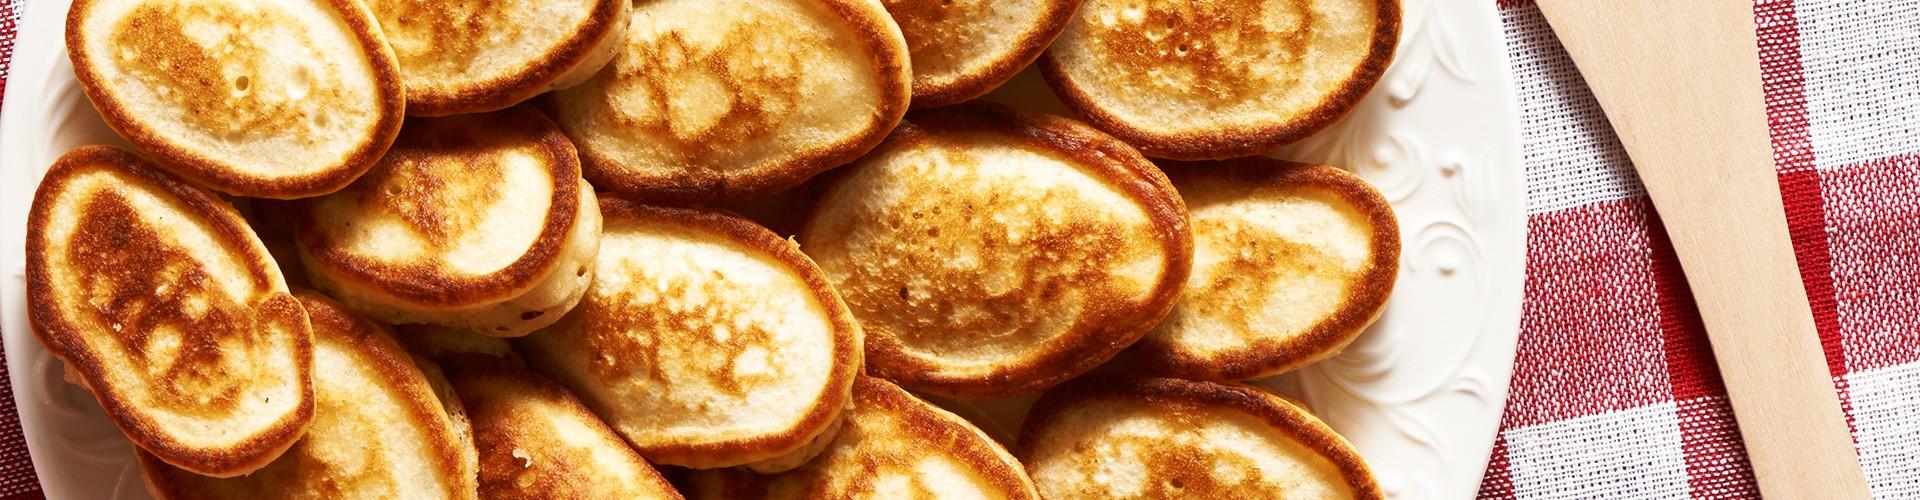 pancake-dippers